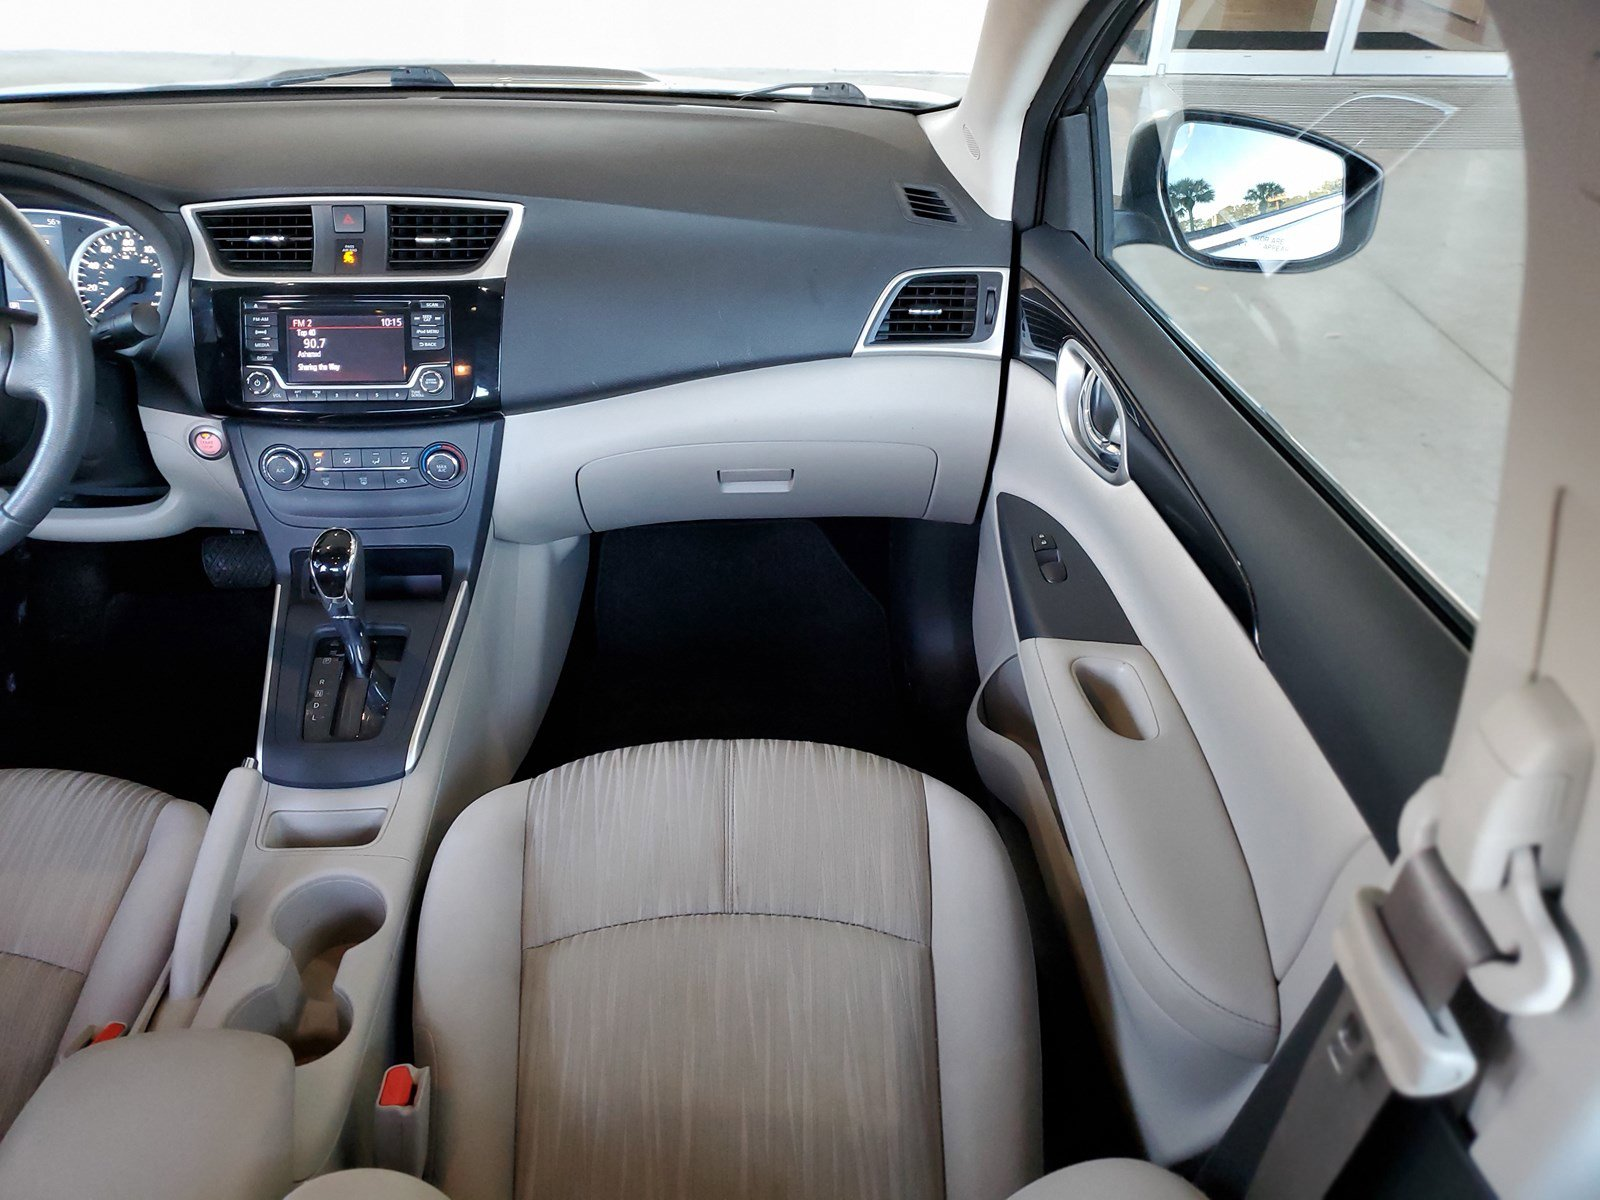 Pre-Owned 2017 Nissan Sentra SV